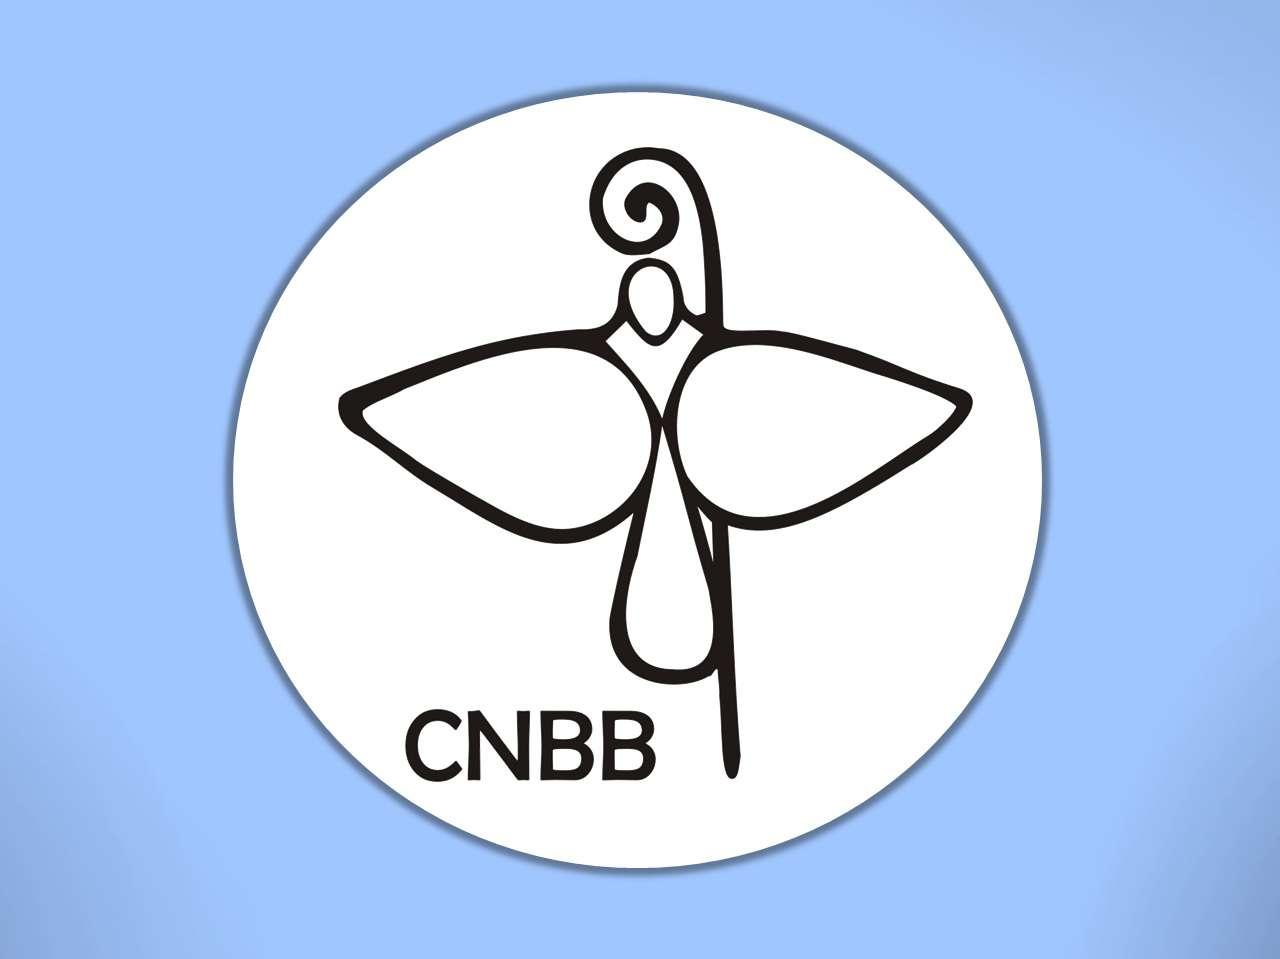 http://www.cnbb.org.br/